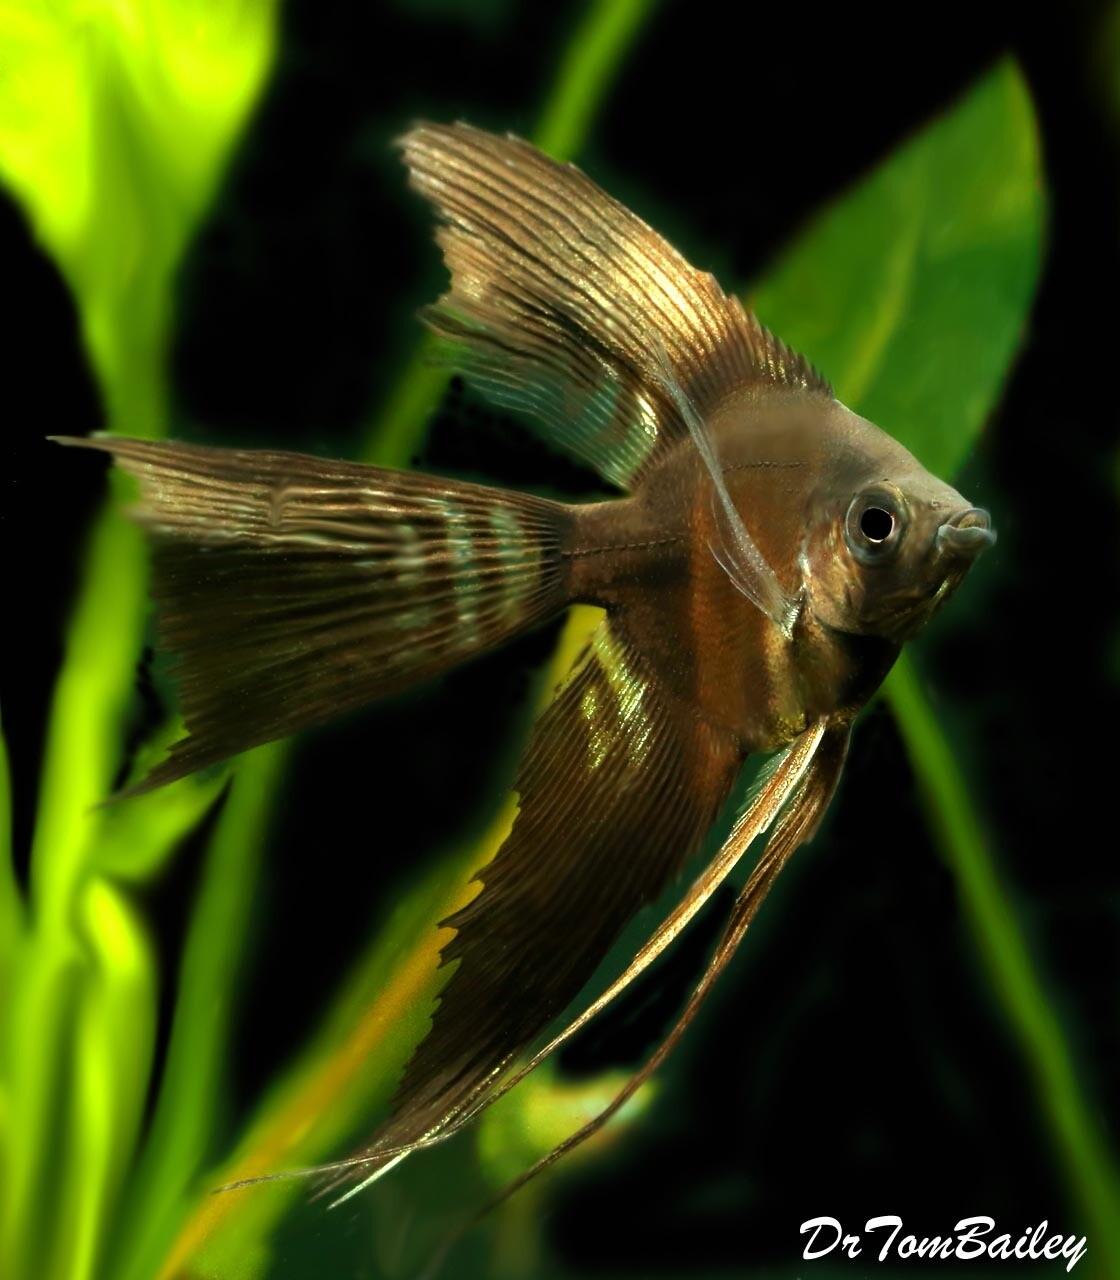 "Premium Rare, WYSIWYG, Hybrid: Black Veiltail Angelfish X Half-Black Veiltail Angelfish, 3.5"" to 4"" tall, Superb !!, in our tank G-12."